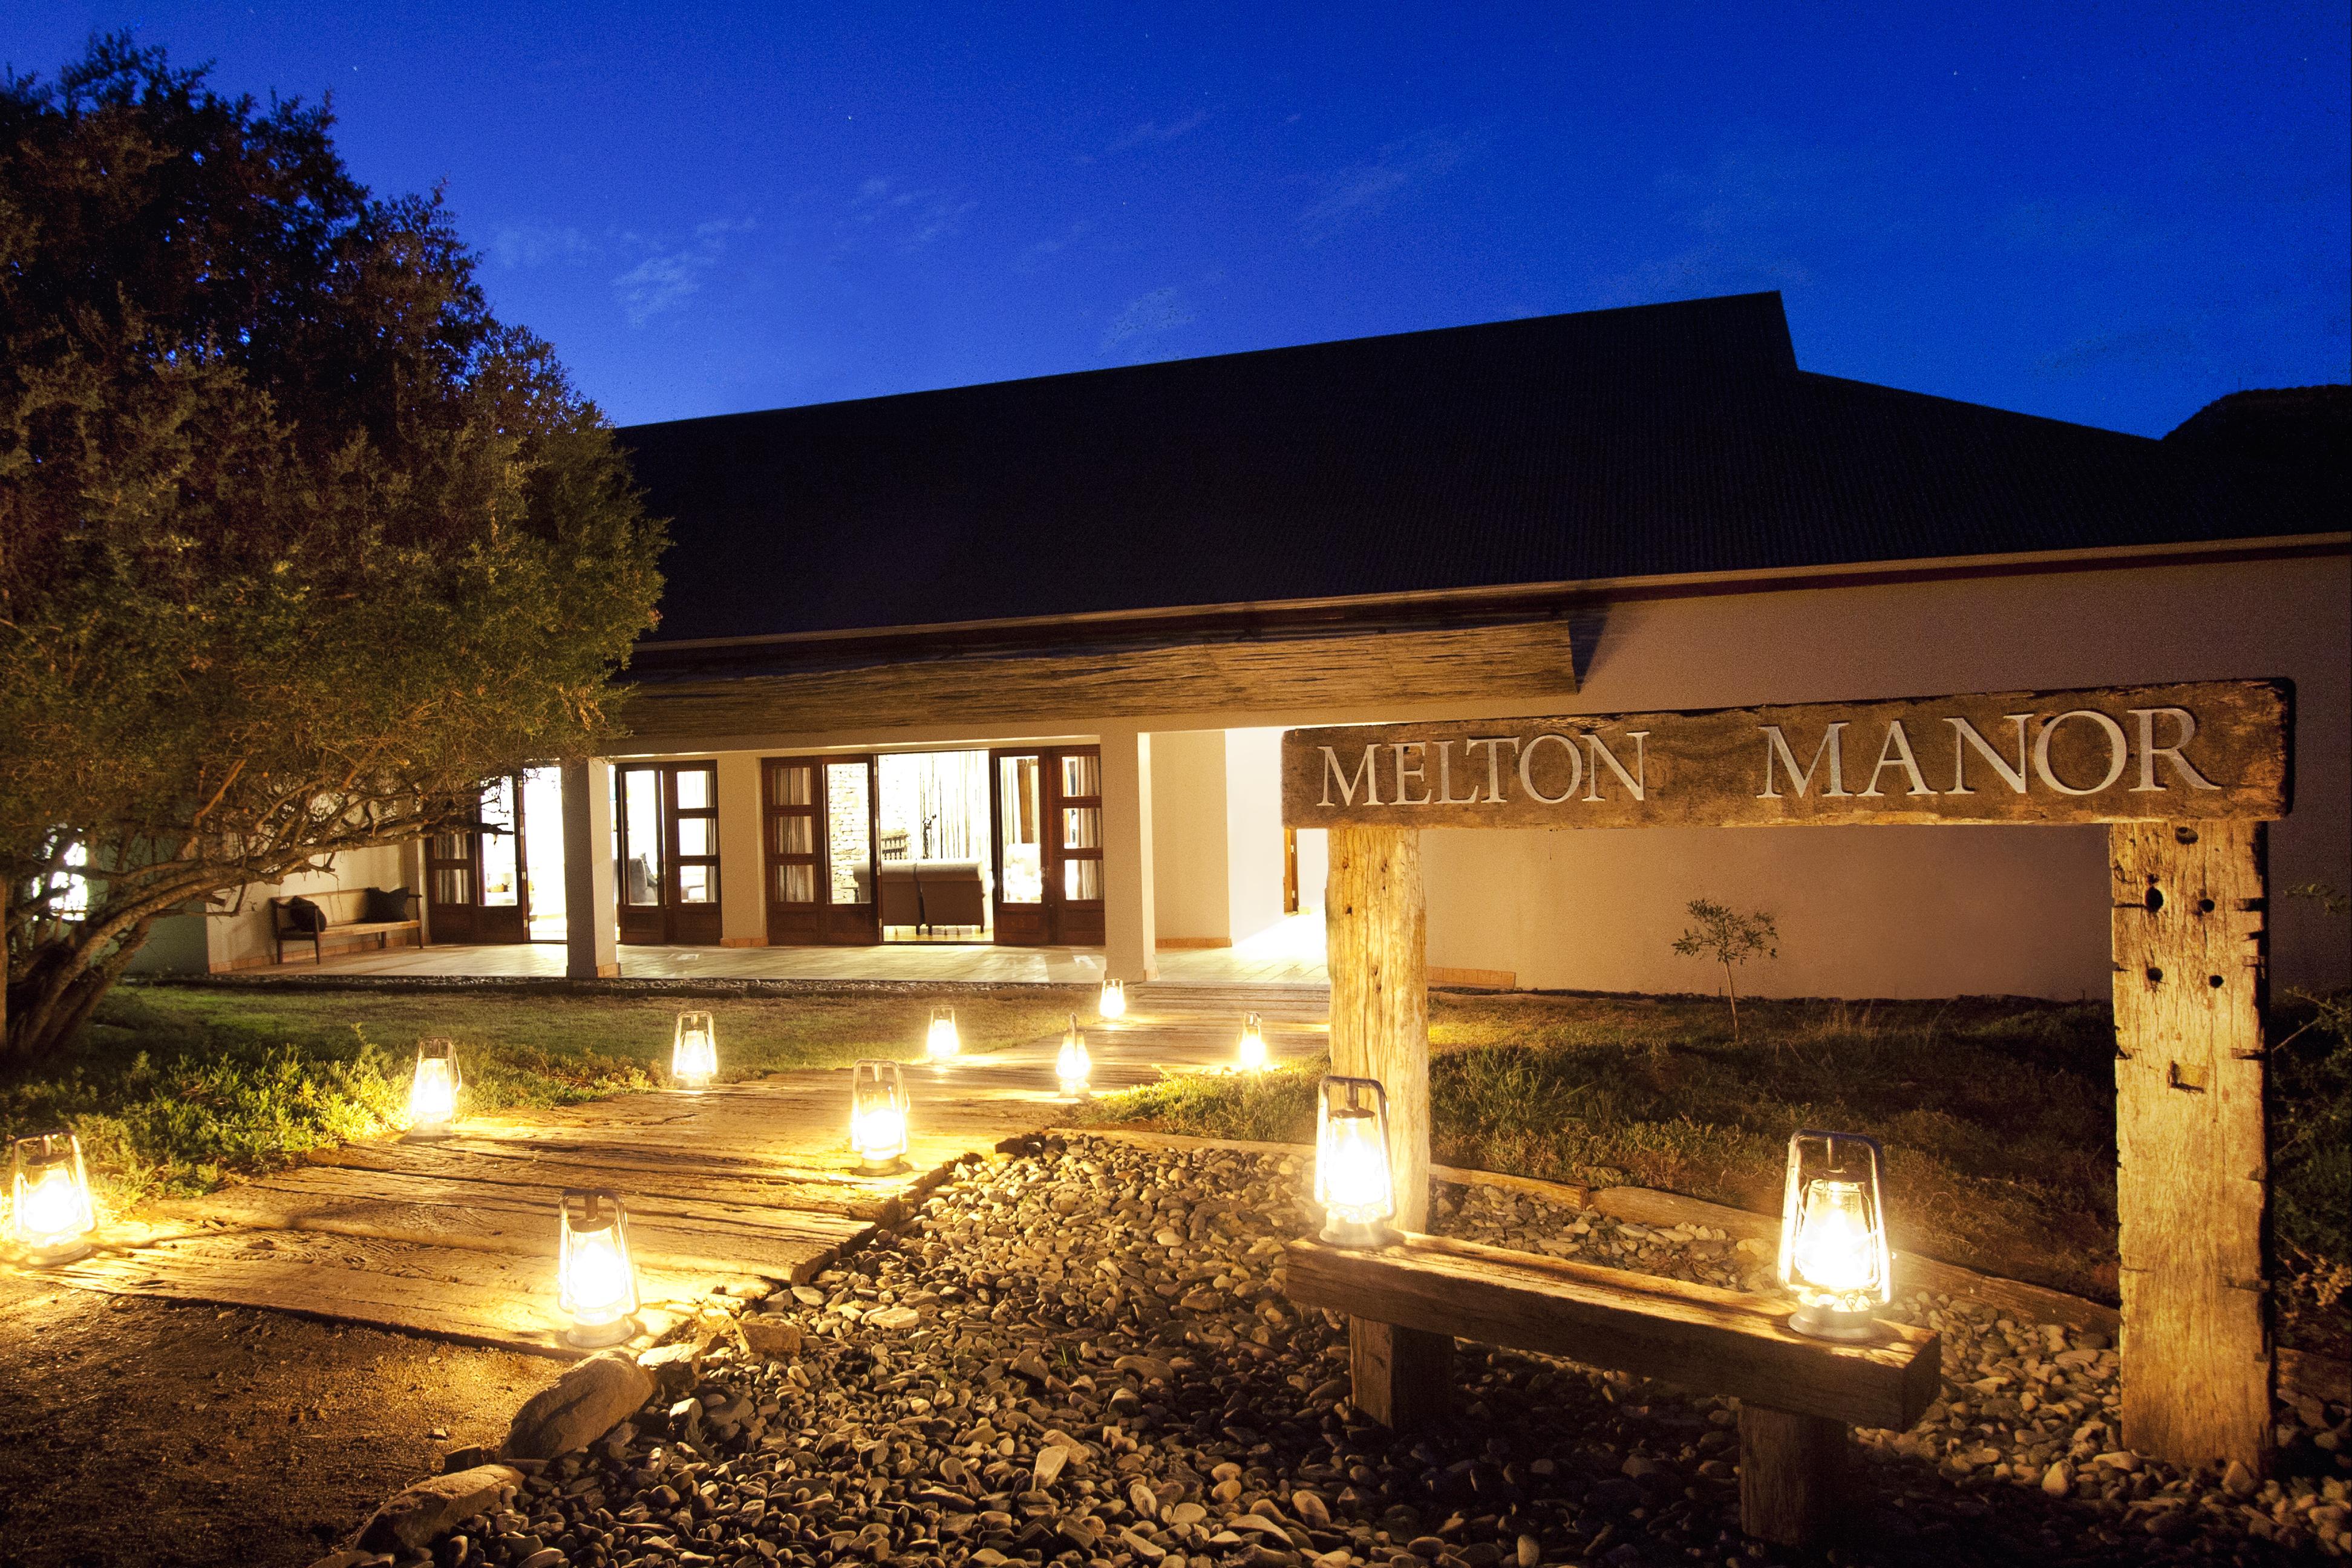 Melton Manor South Africa Exterior